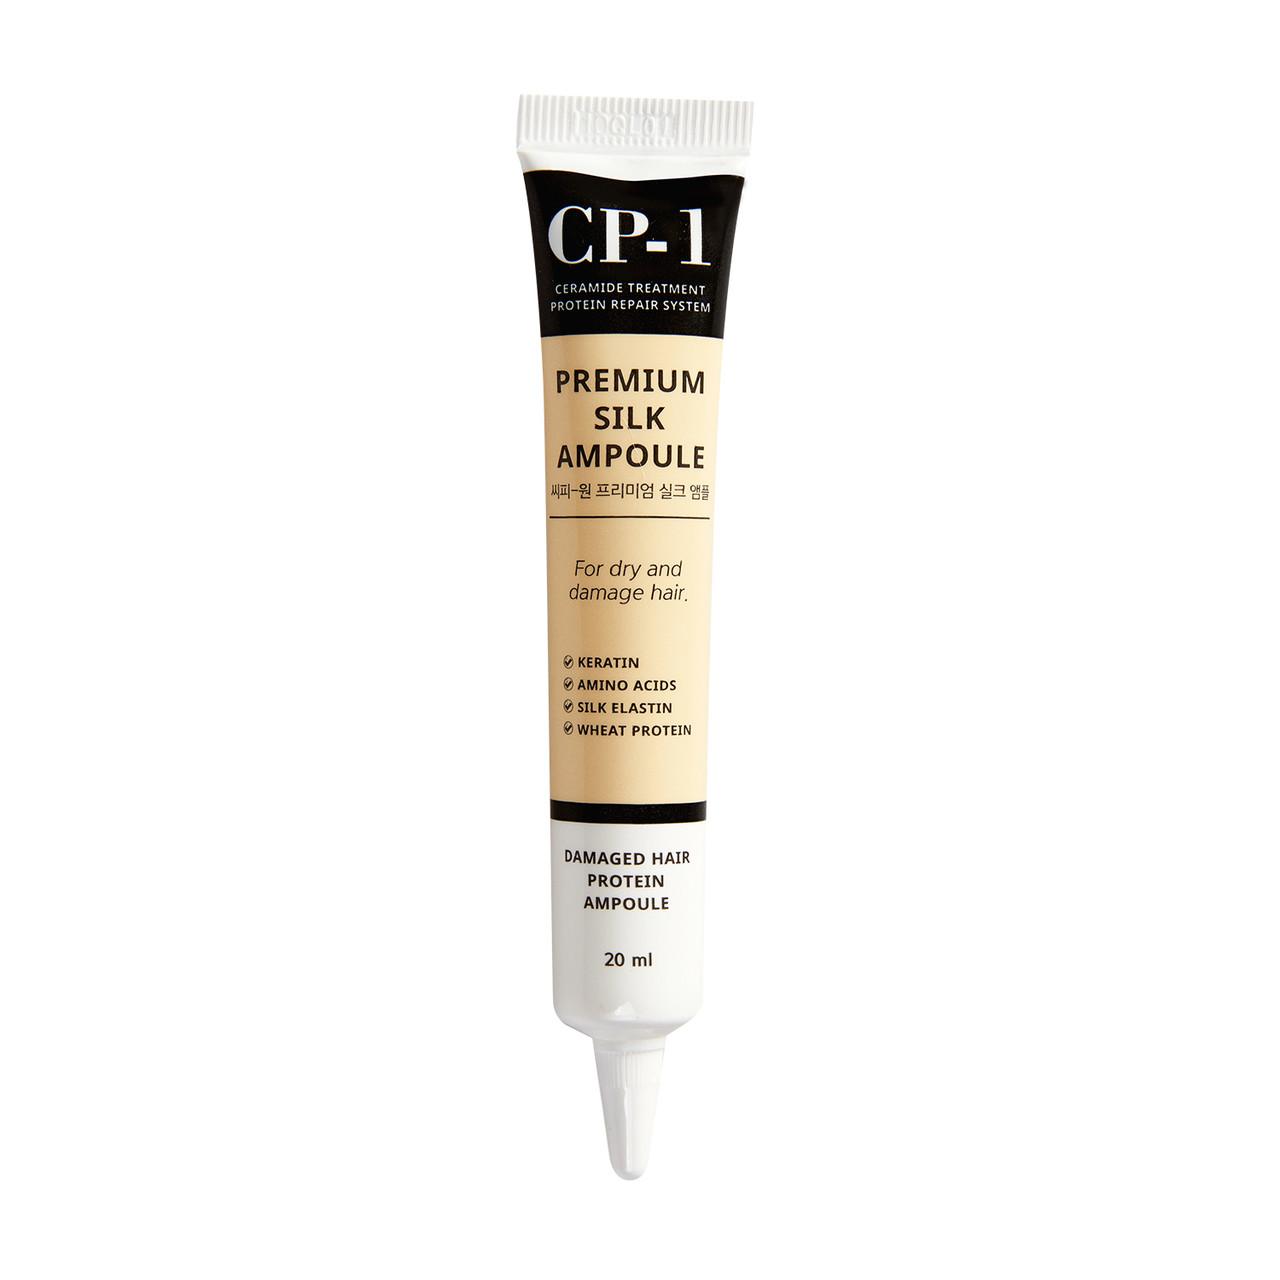 Восстанавливающая сыворотка для волос с протеинами шелка Esthetic House CP-1 Premium Silk Ampoule 20 мл